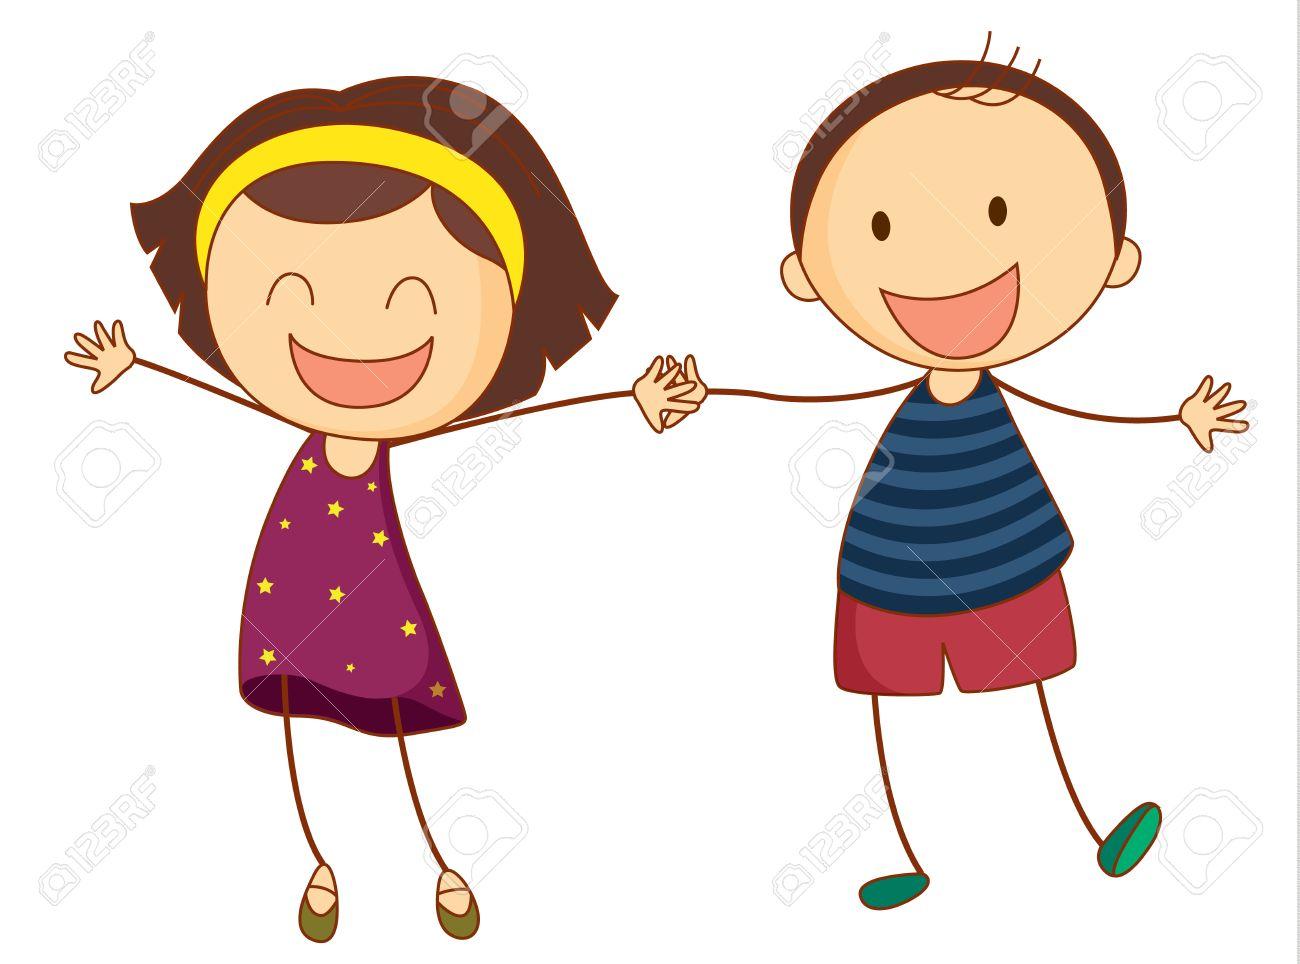 Illustration of 2 girls holding hands.